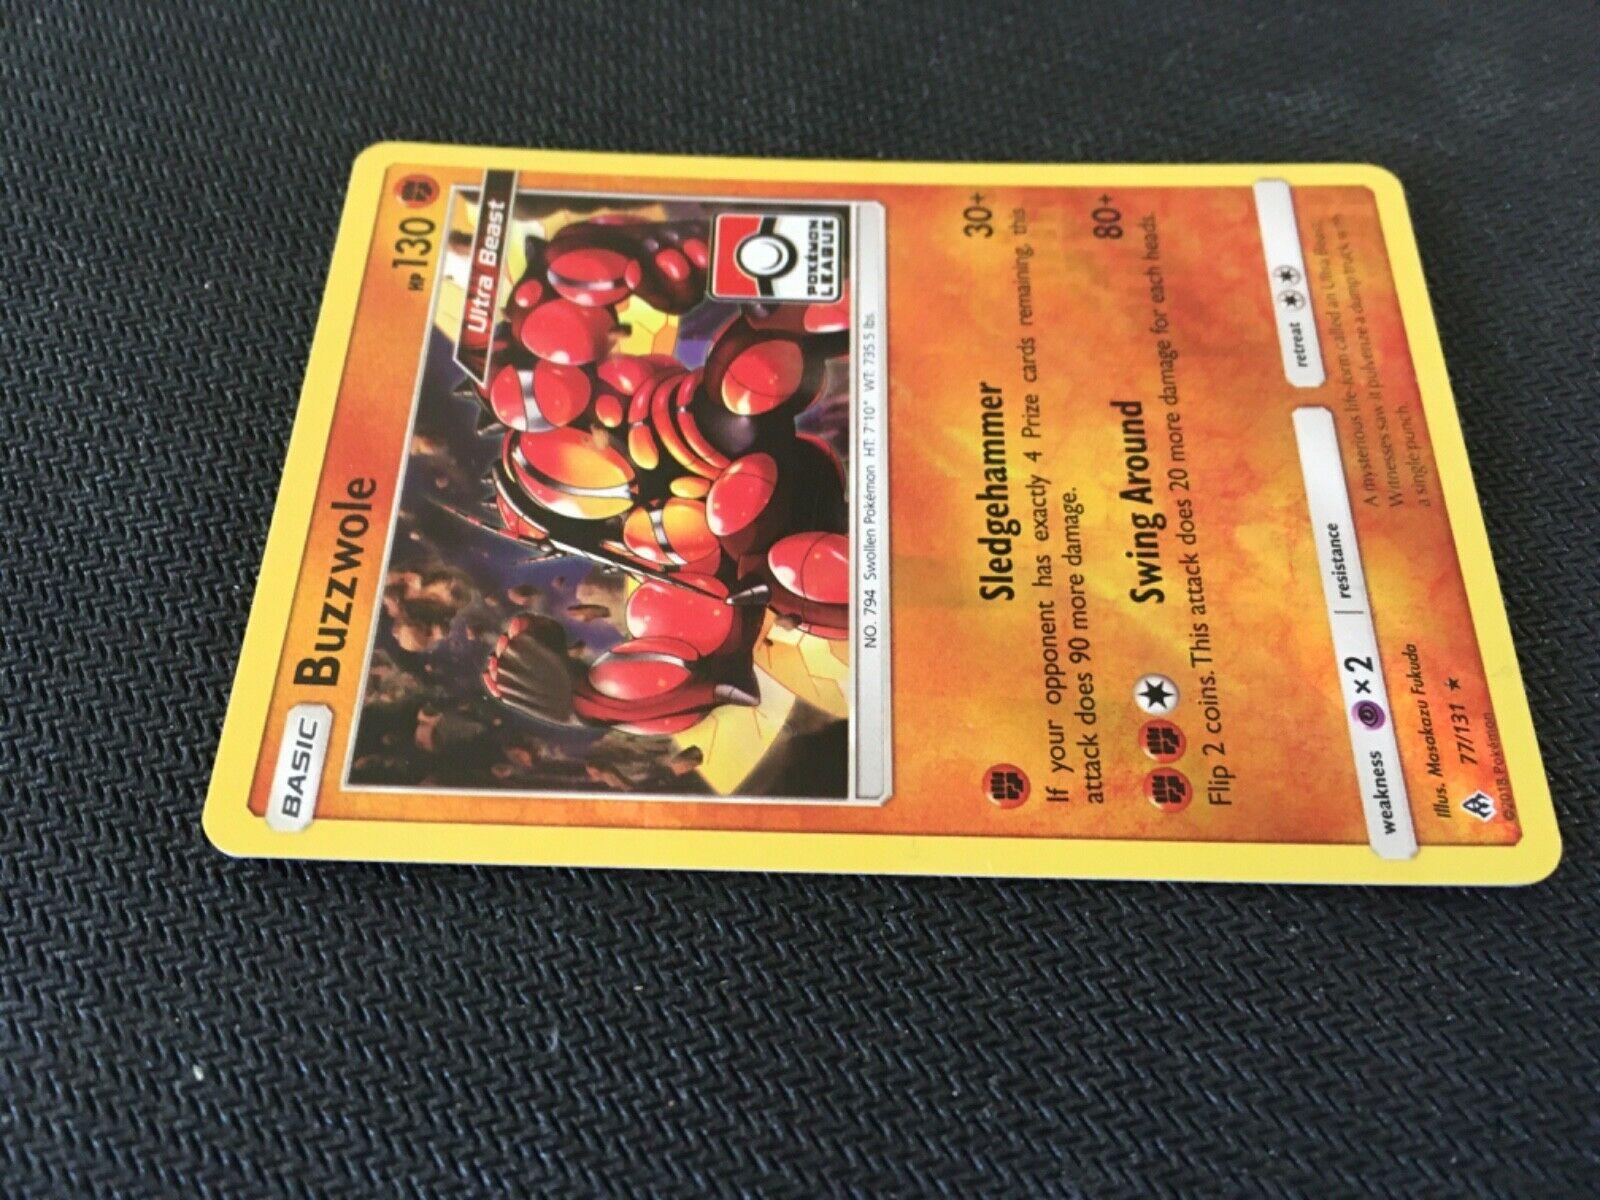 Buzzwole Rare Holo League Promo Pokemon Card Trainer Item Forbidden Light 77/131 - Image 6